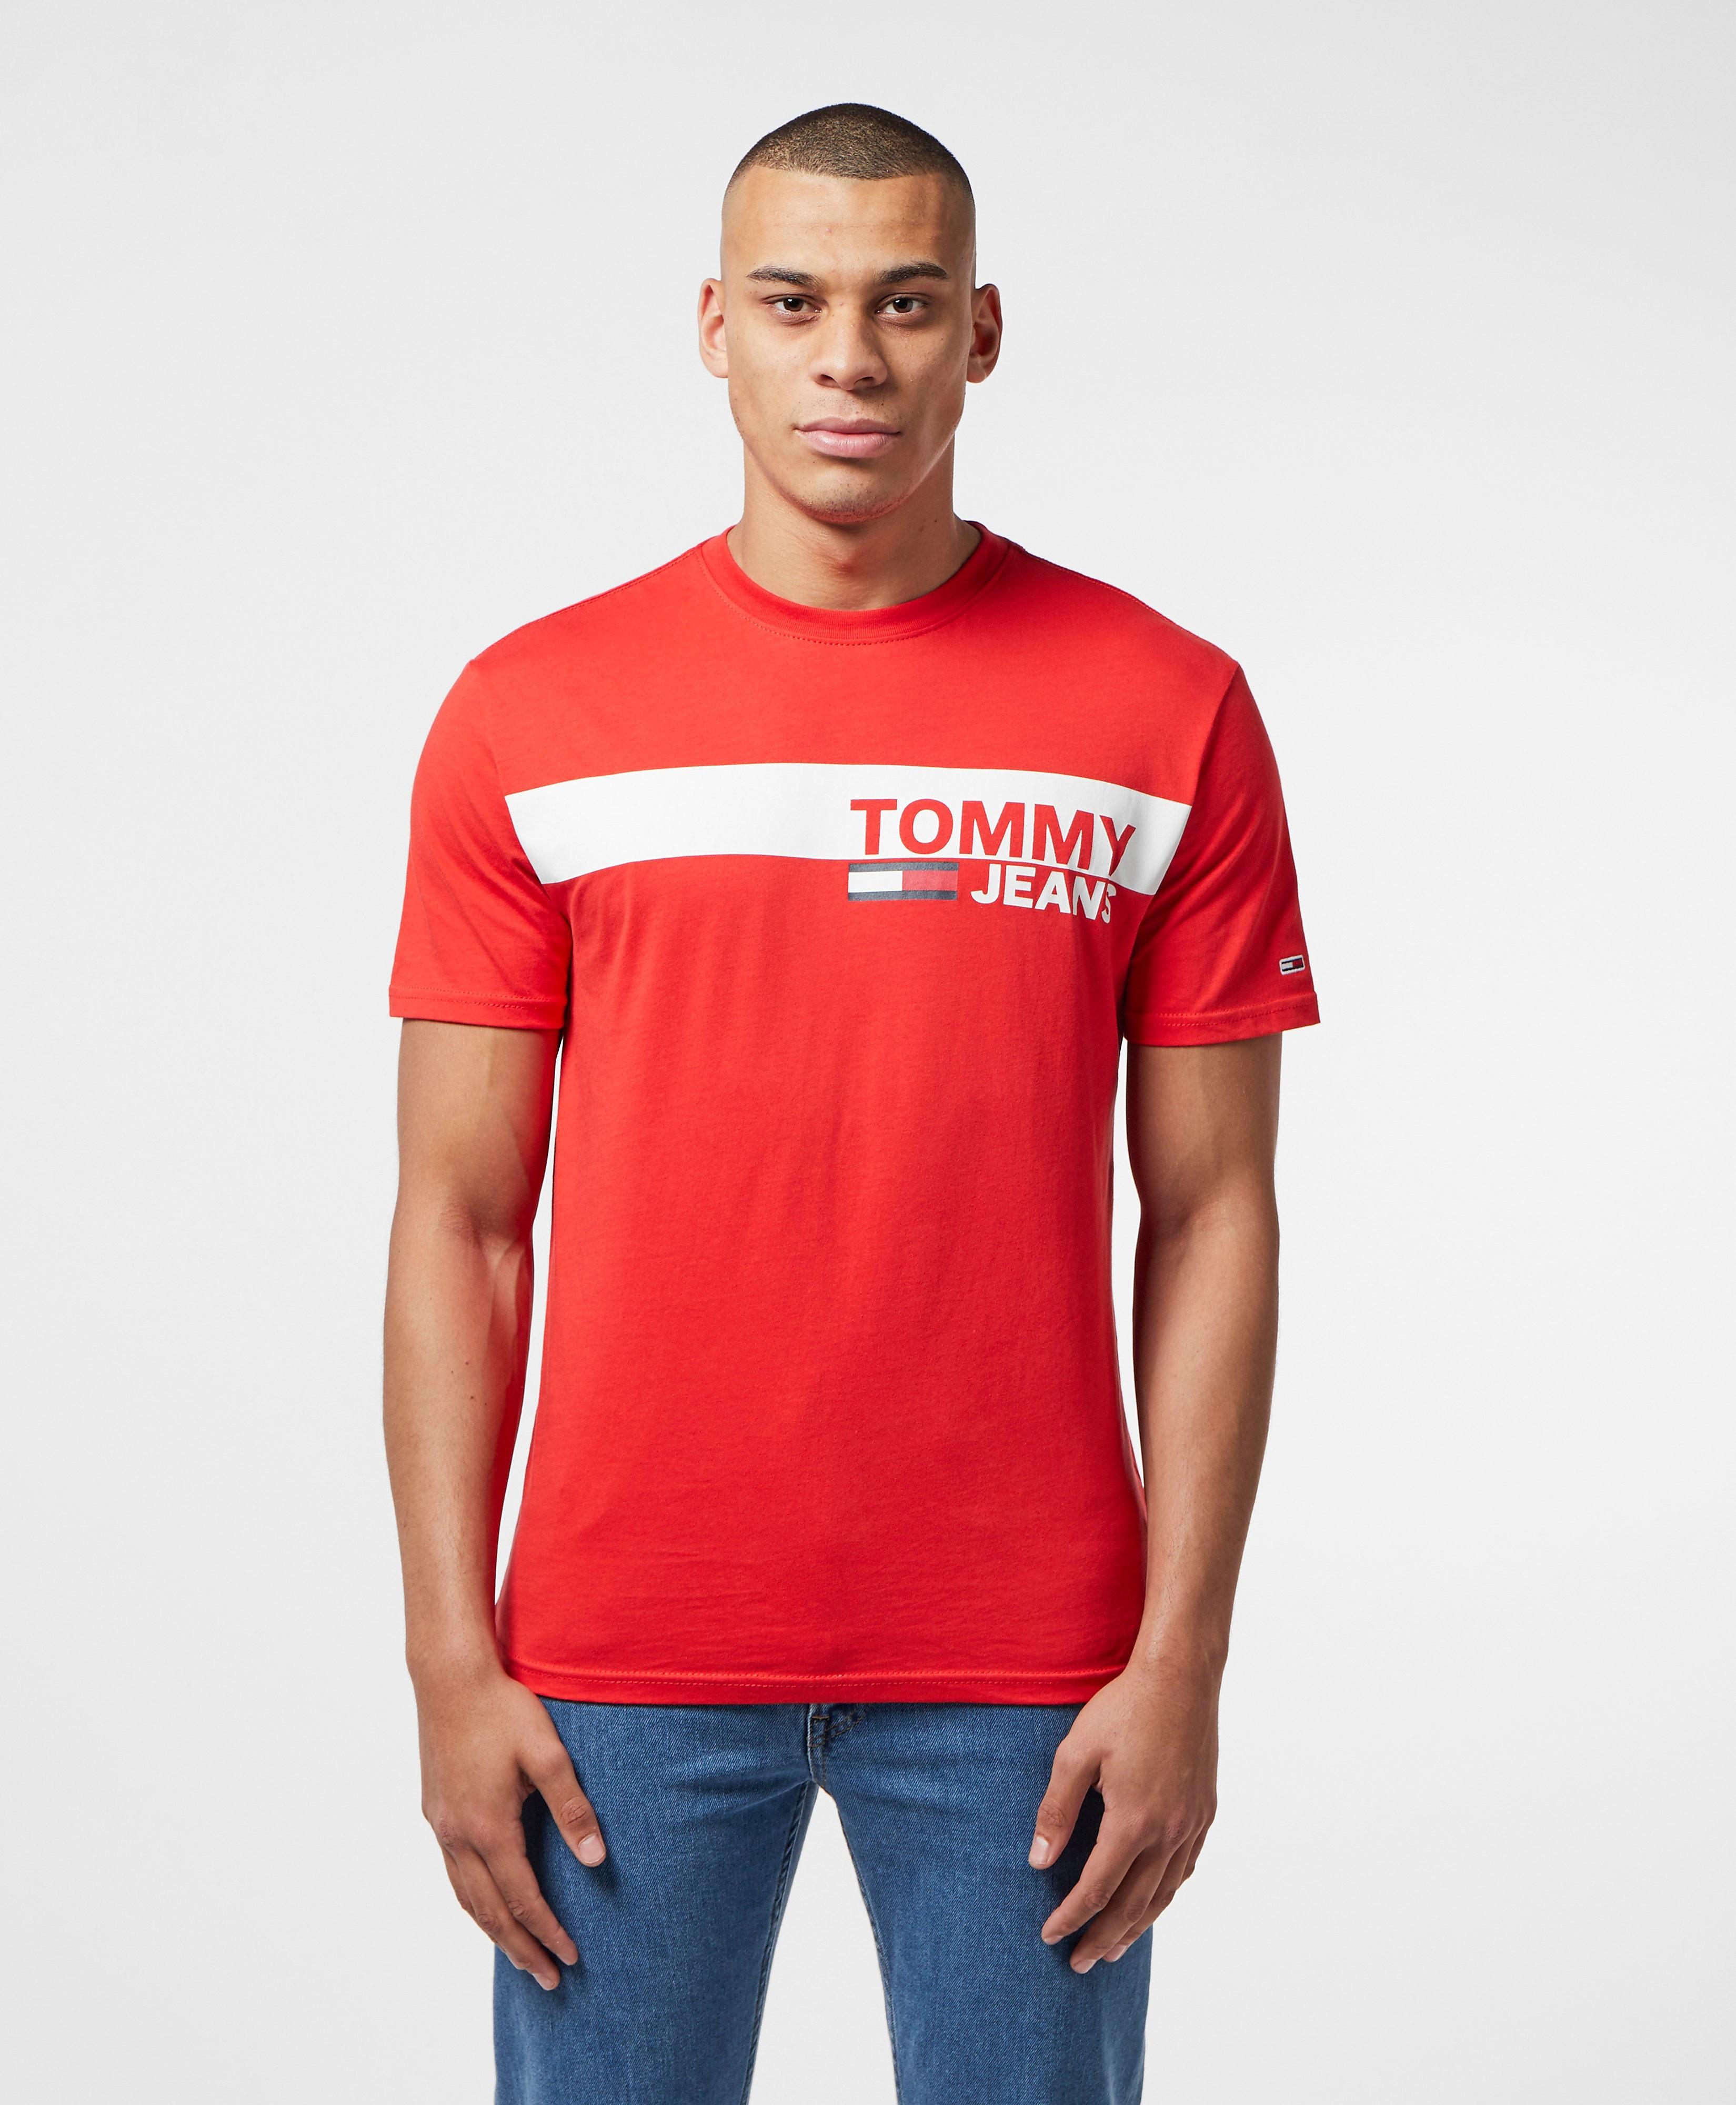 Tommy Jeans Panel Logo Short Sleeve T-Shirt